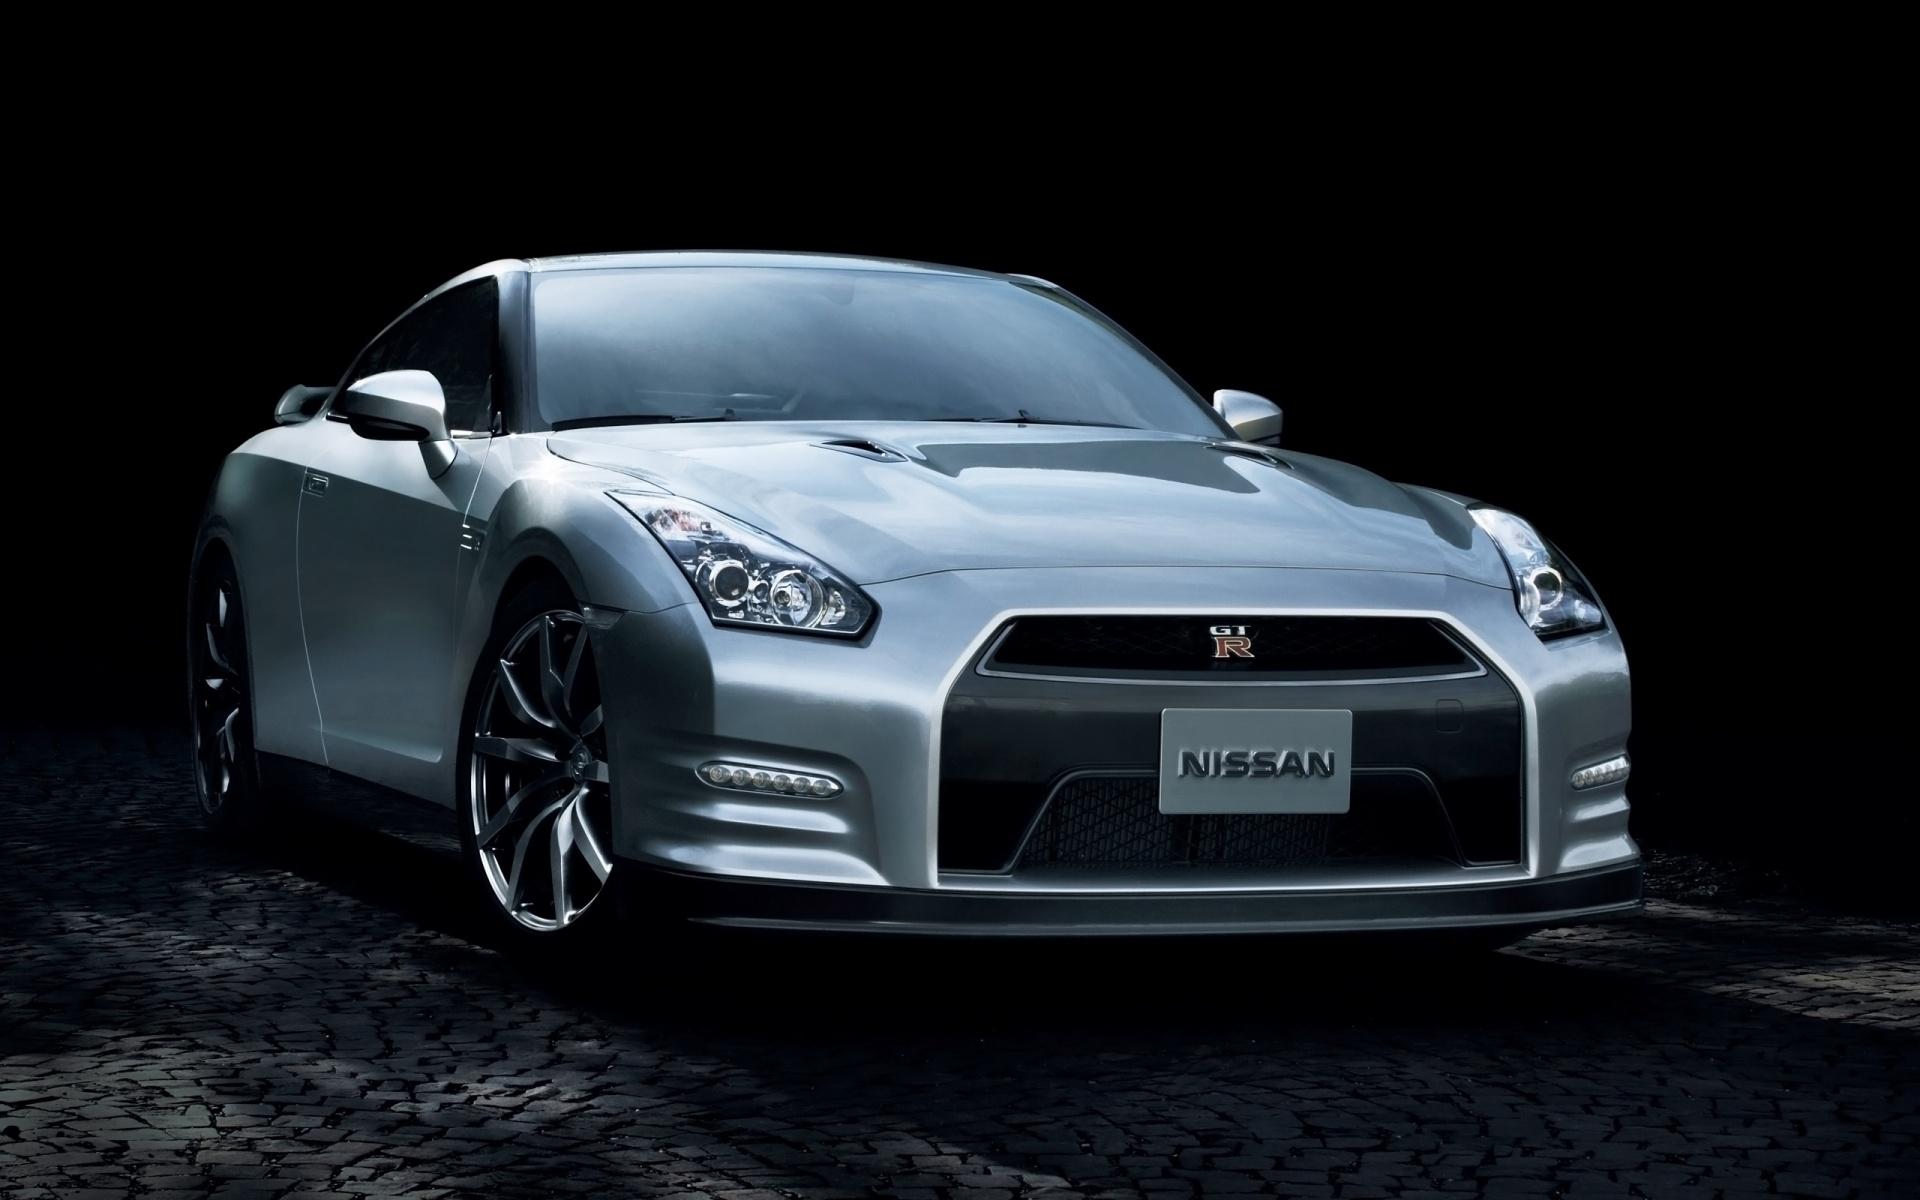 Nissan GT R 2014 Wallpaper HD Car Wallpapers 1920x1200